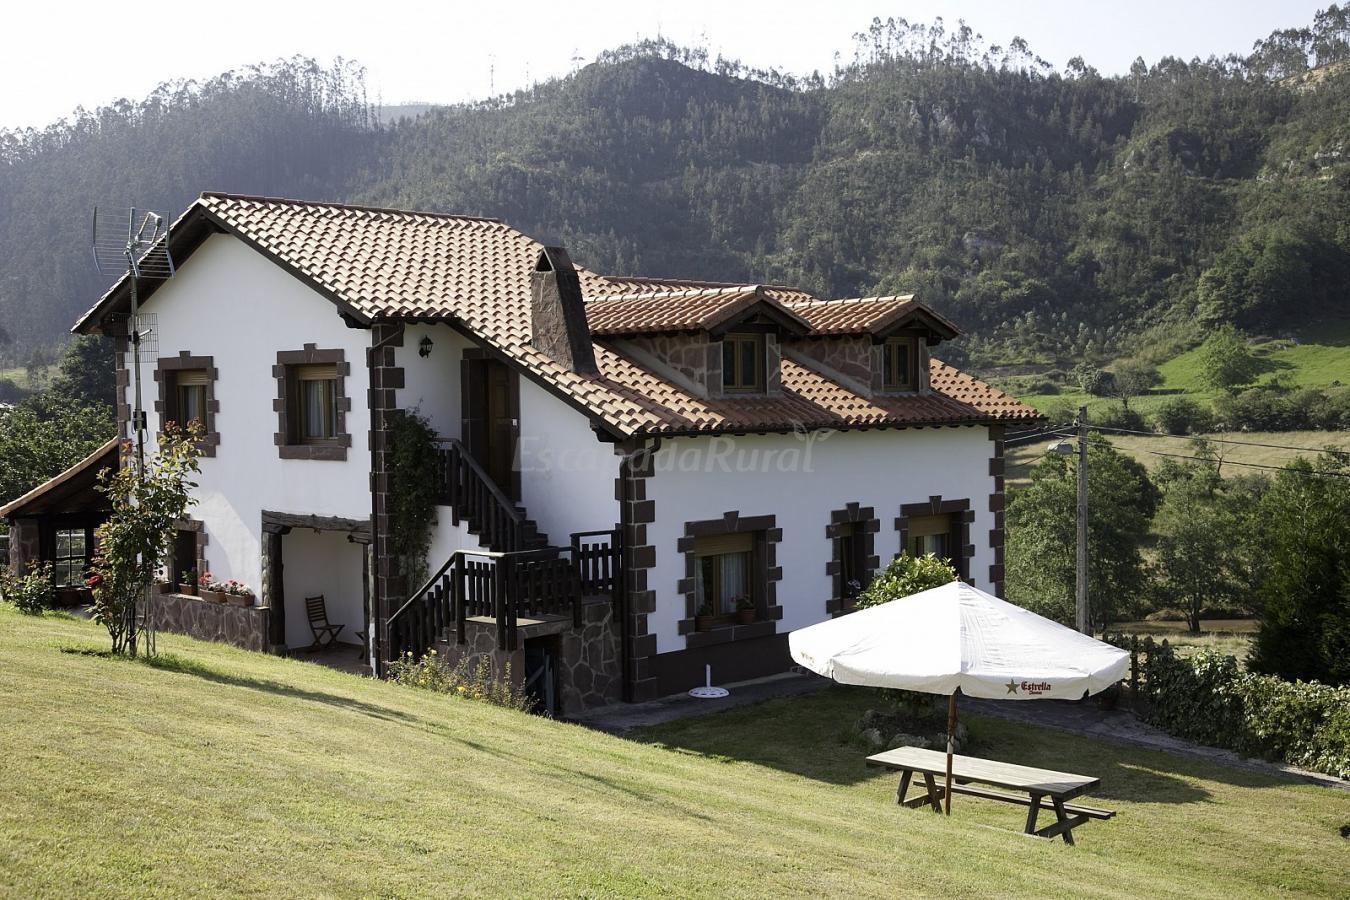 Fotos de apartamentos rulolla casa de campo em roiz - Casas de campo en cantabria ...